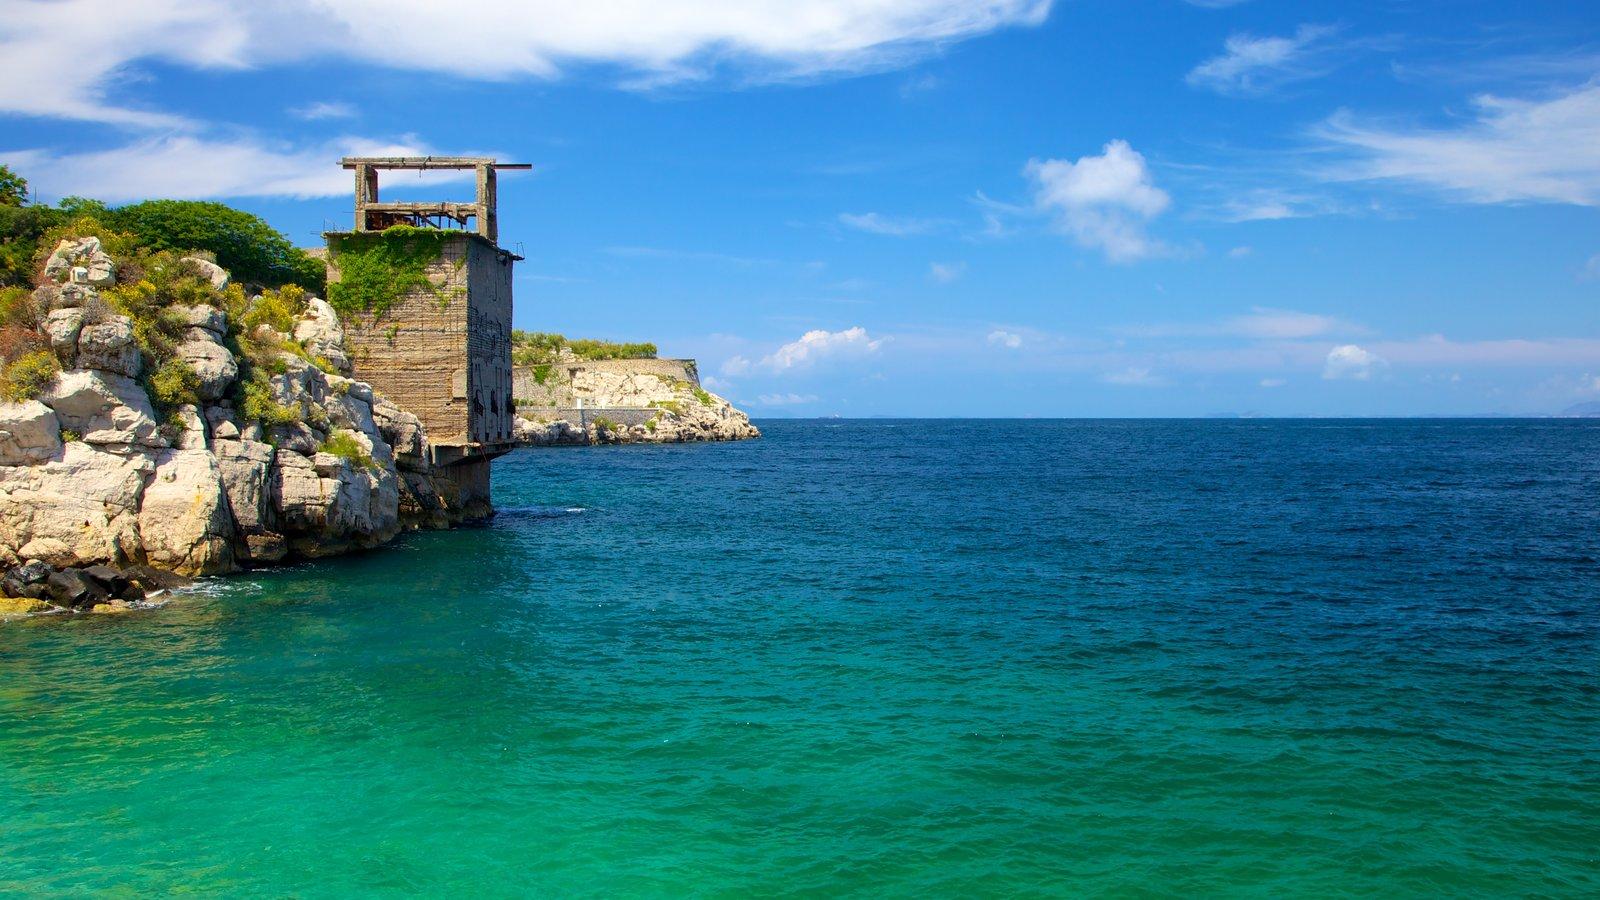 Sorrento featuring rugged coastline